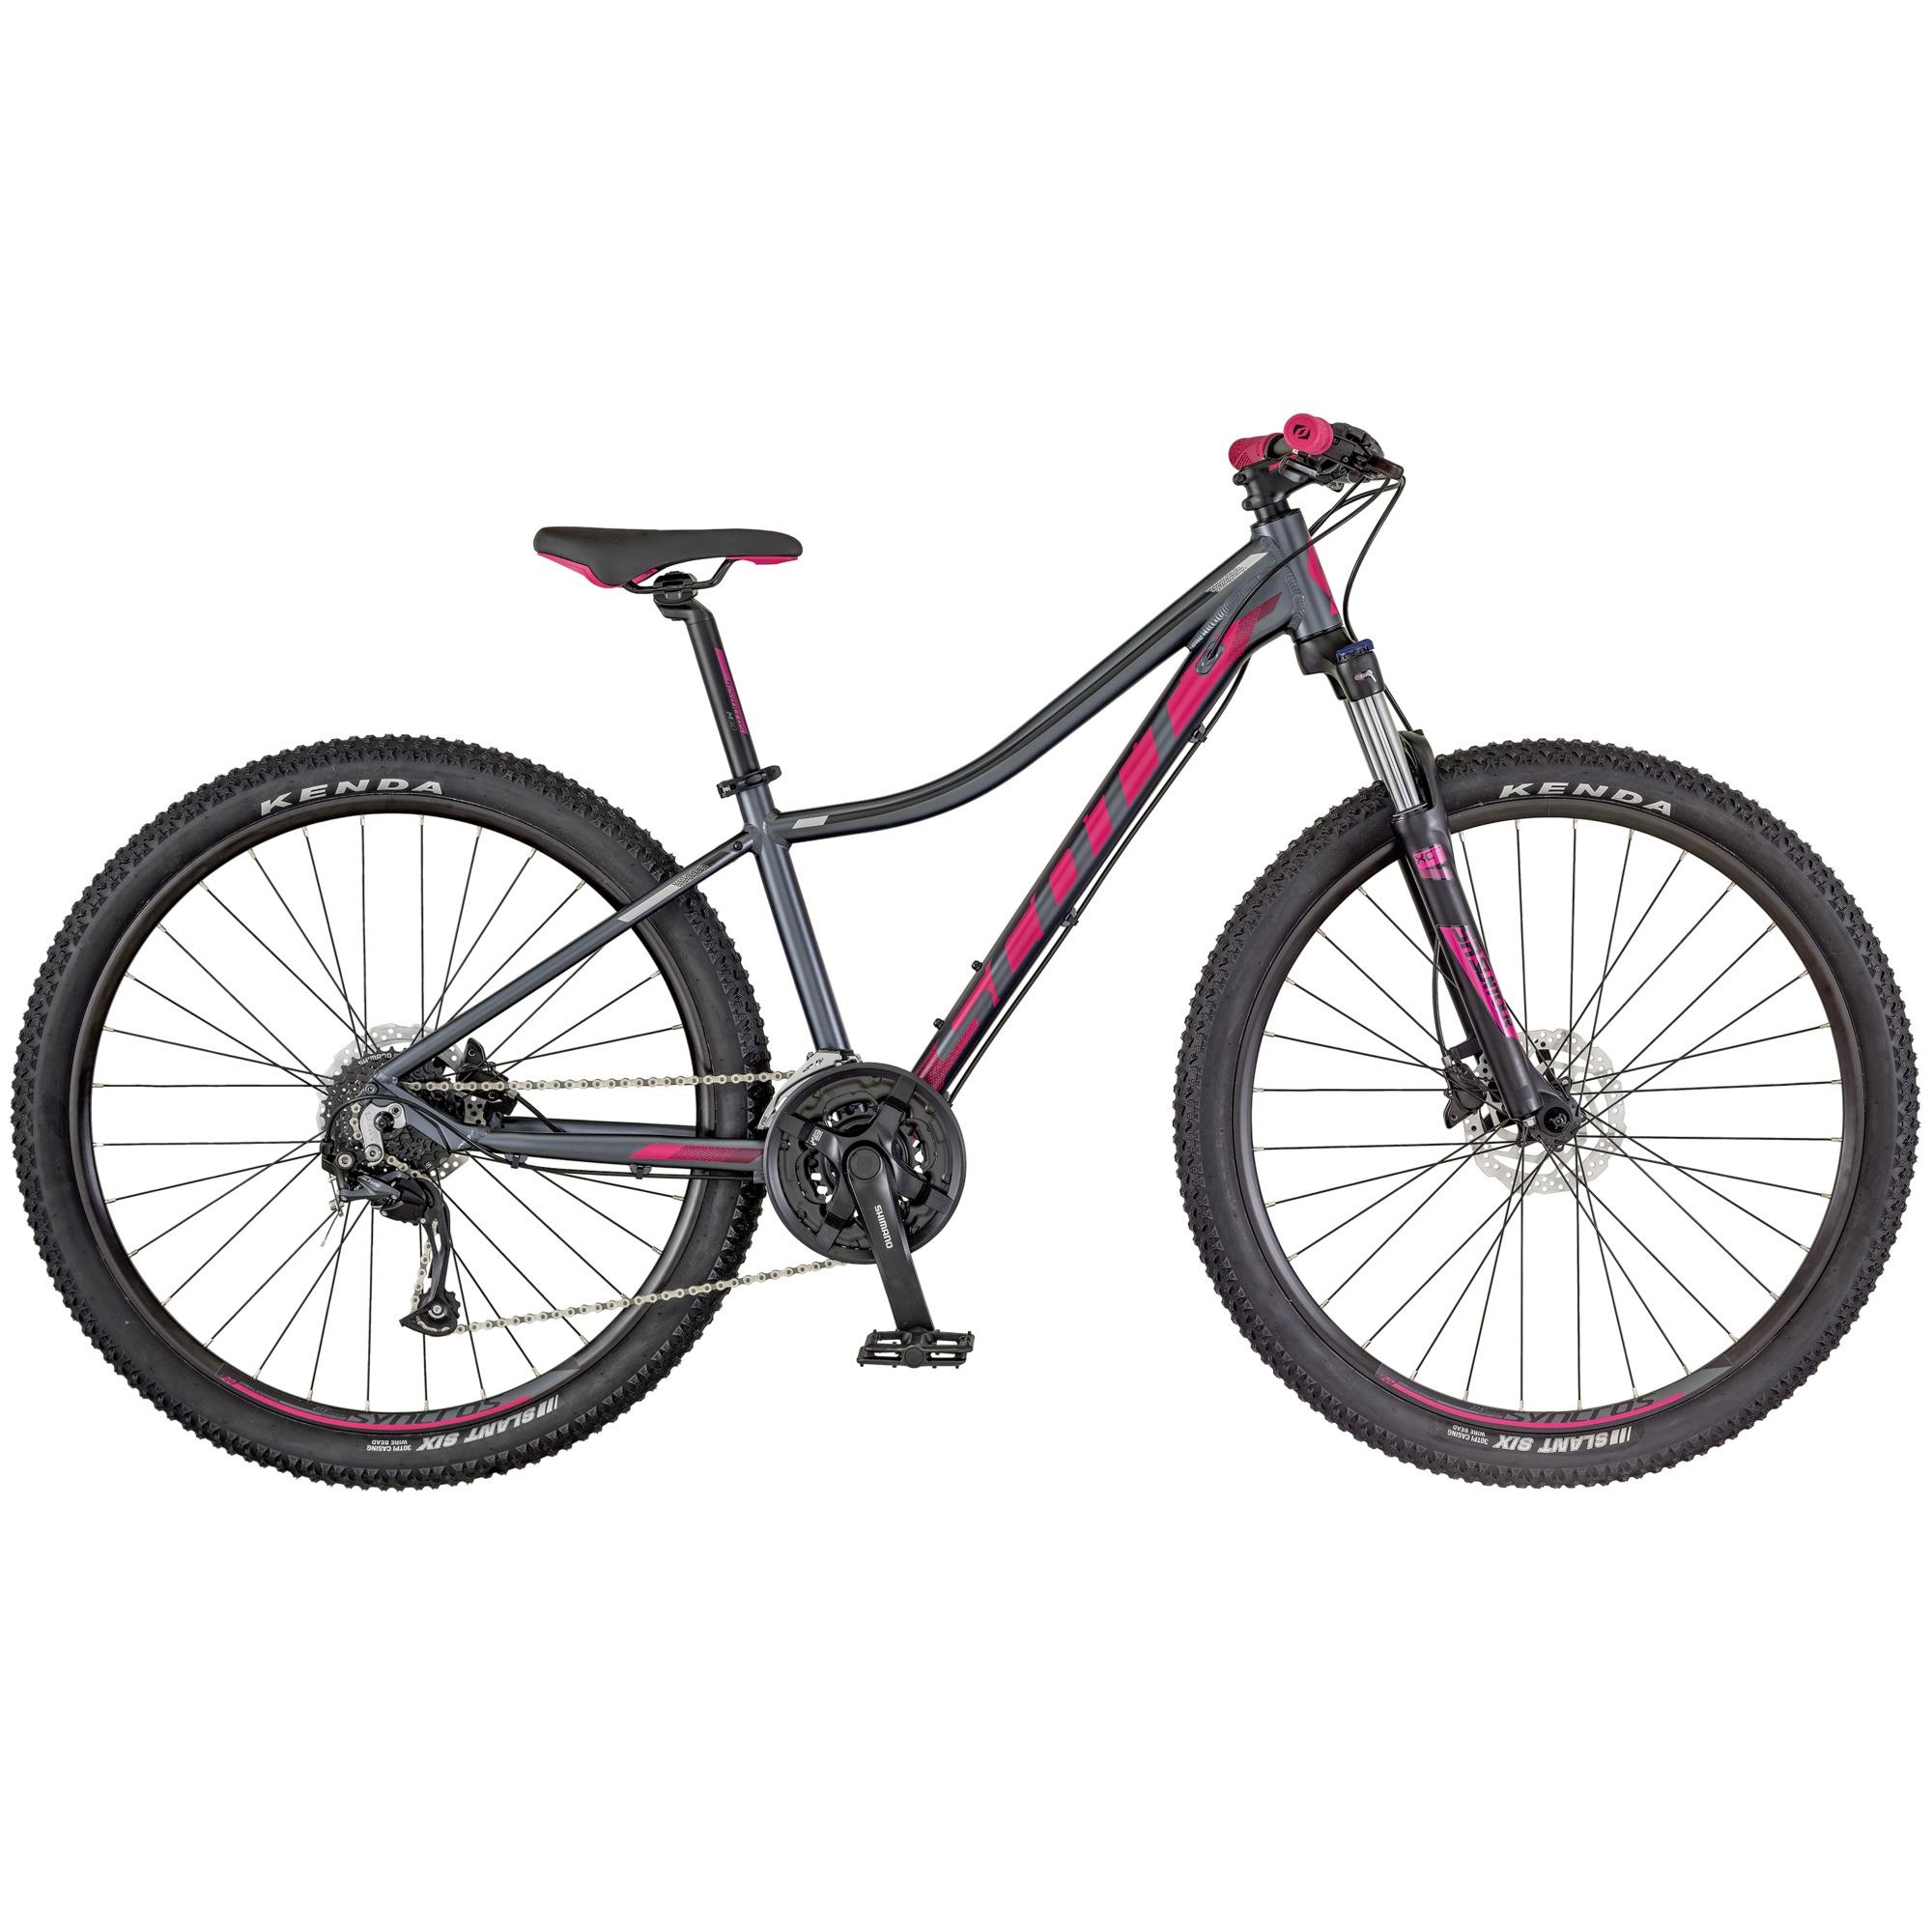 SCOTT Contessa 720 Bike black/pink L - Zweirad Homann